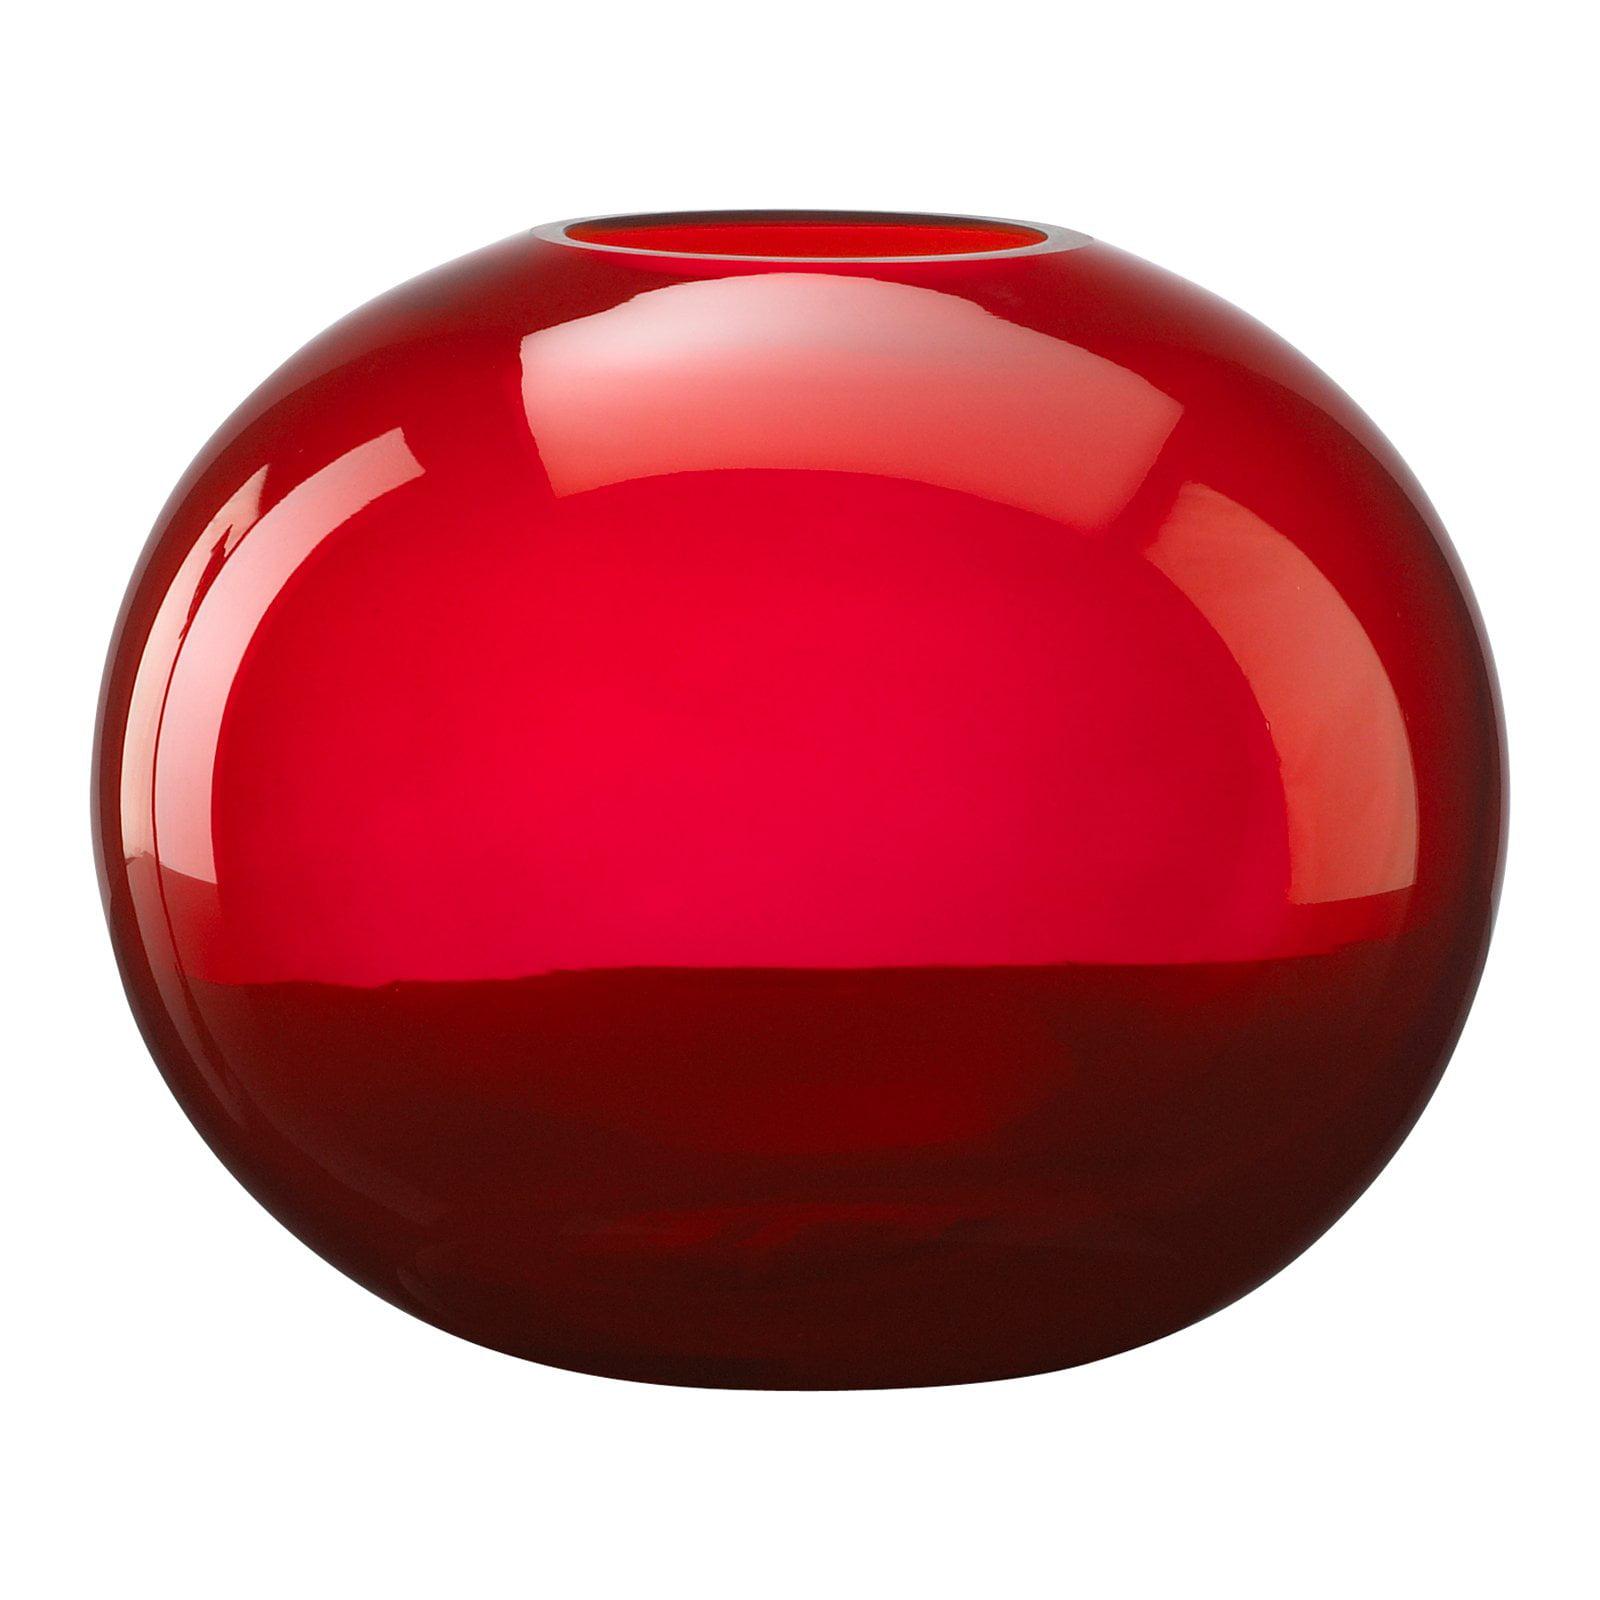 Cyan Design Red Pod Vase